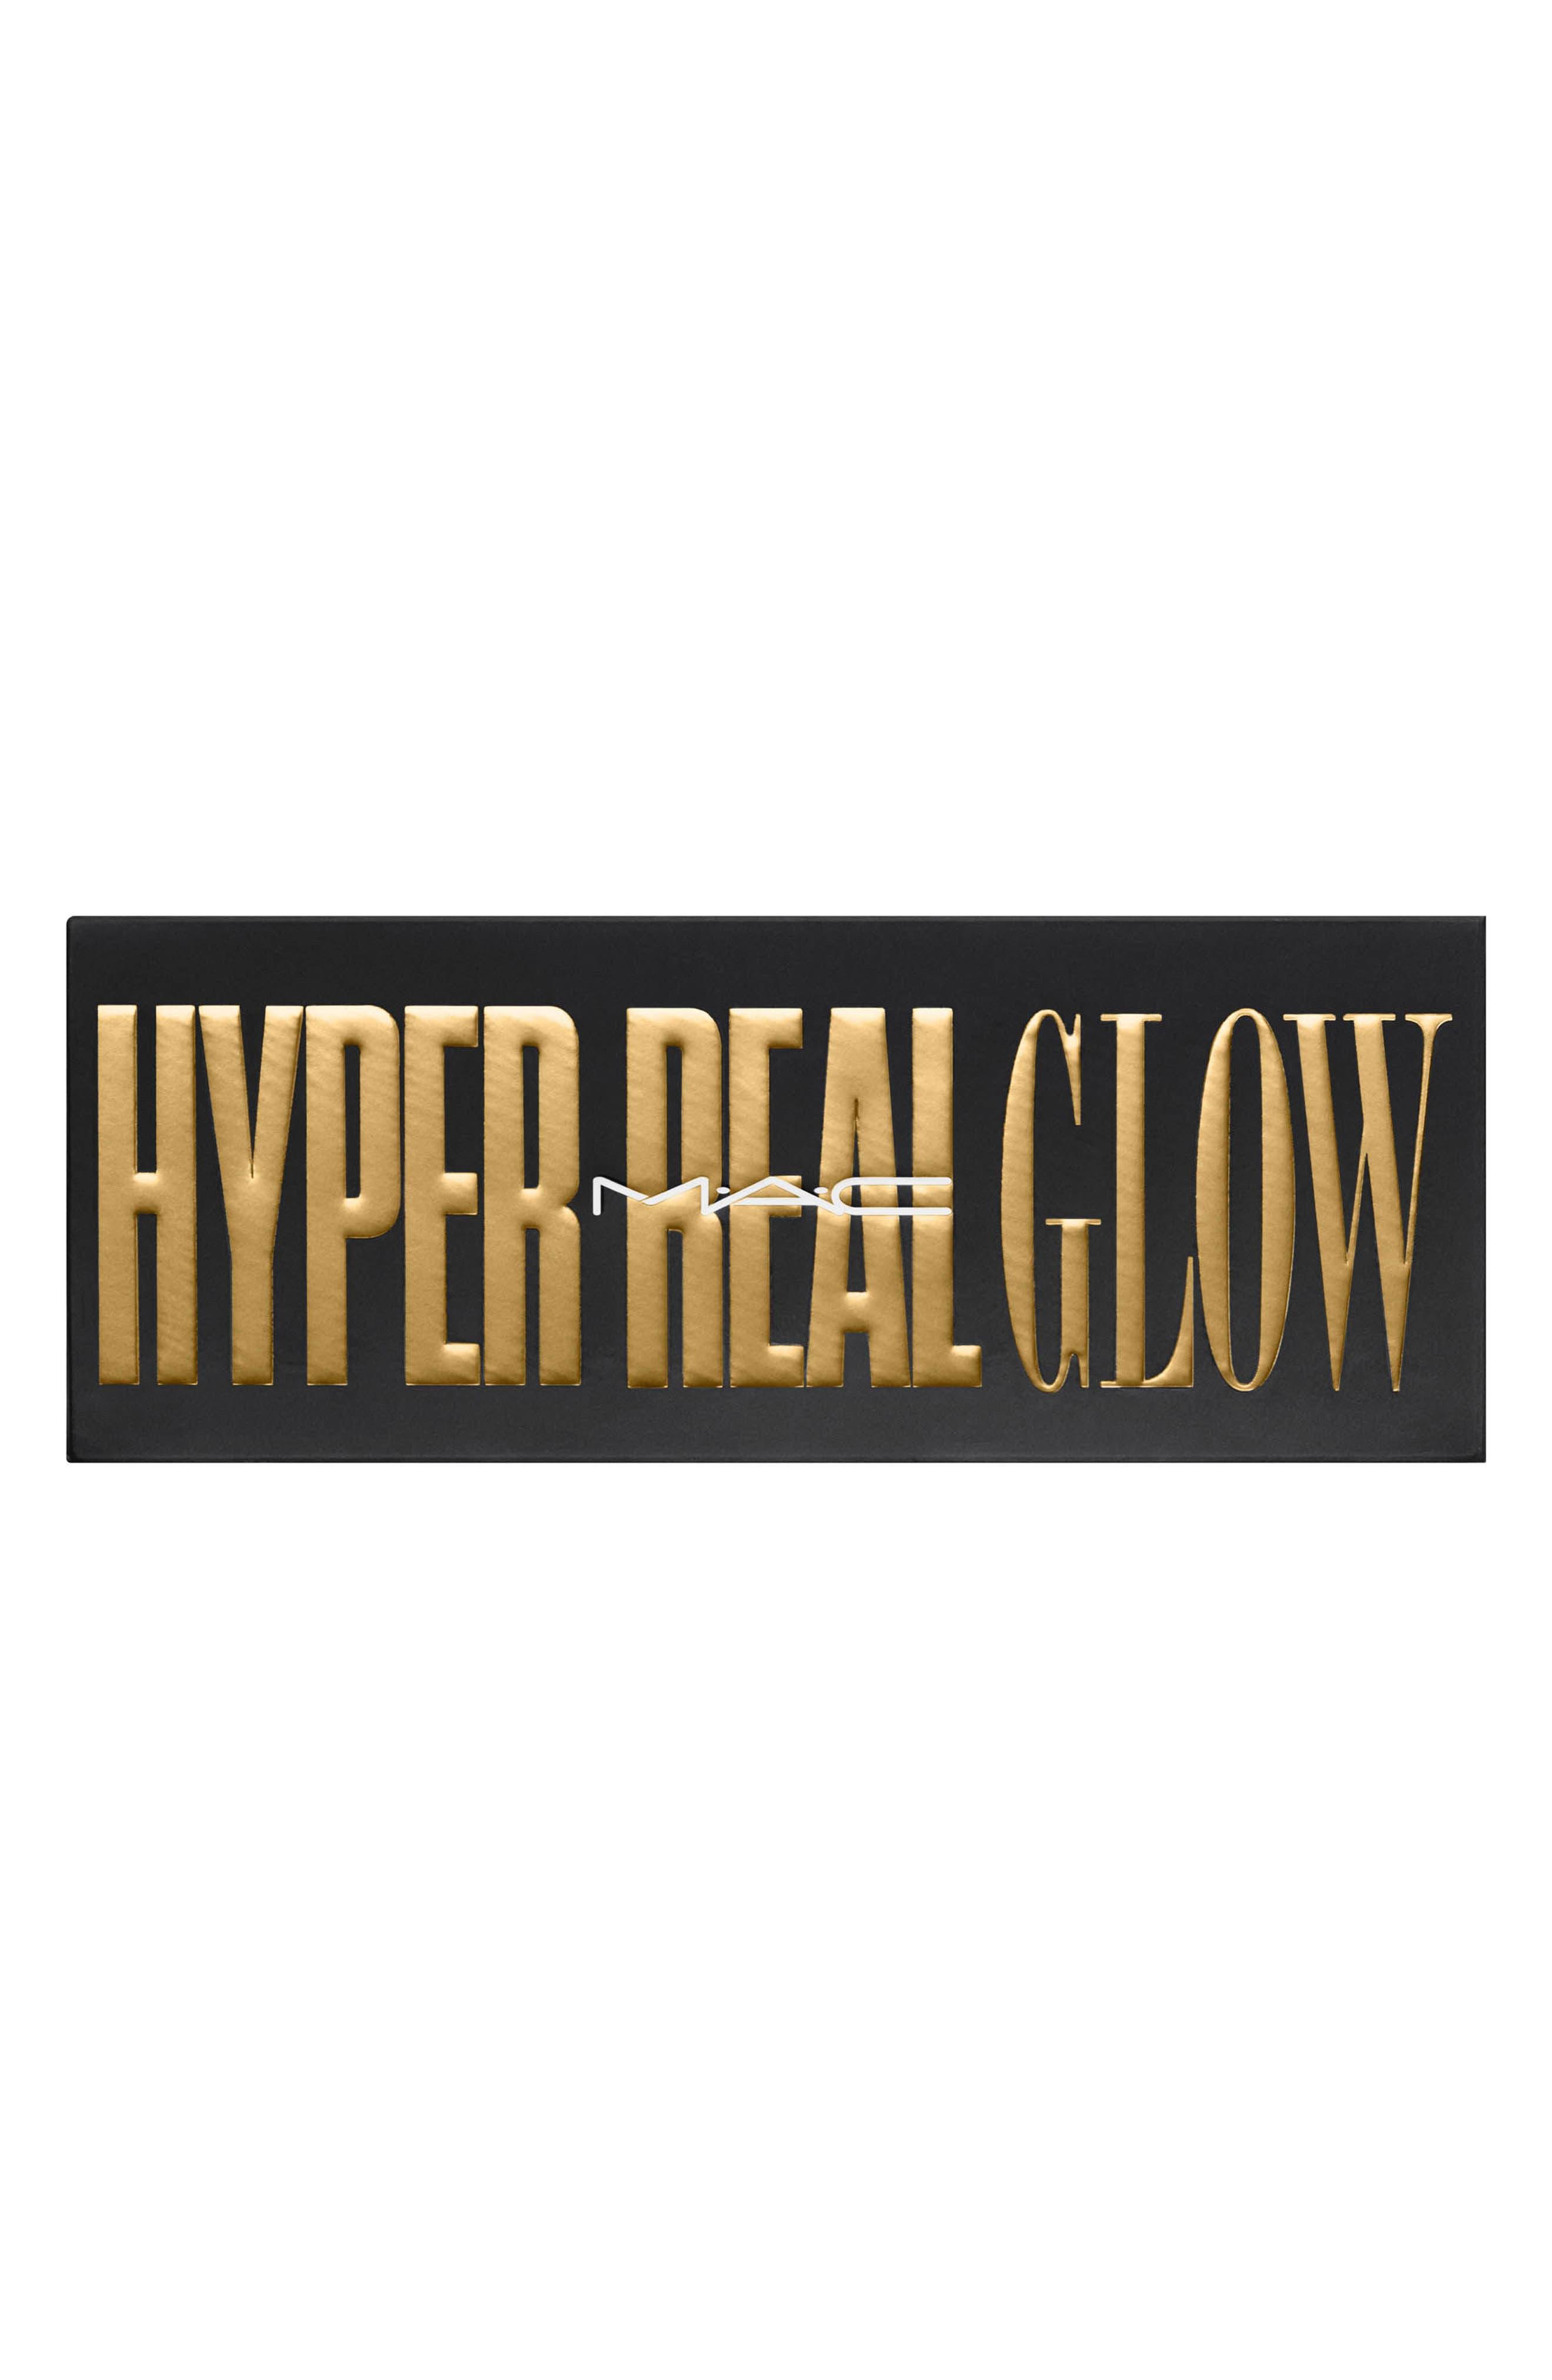 MAC Hyper Real Glow Palette,                             Alternate thumbnail 3, color,                             GET IT GLOWIN